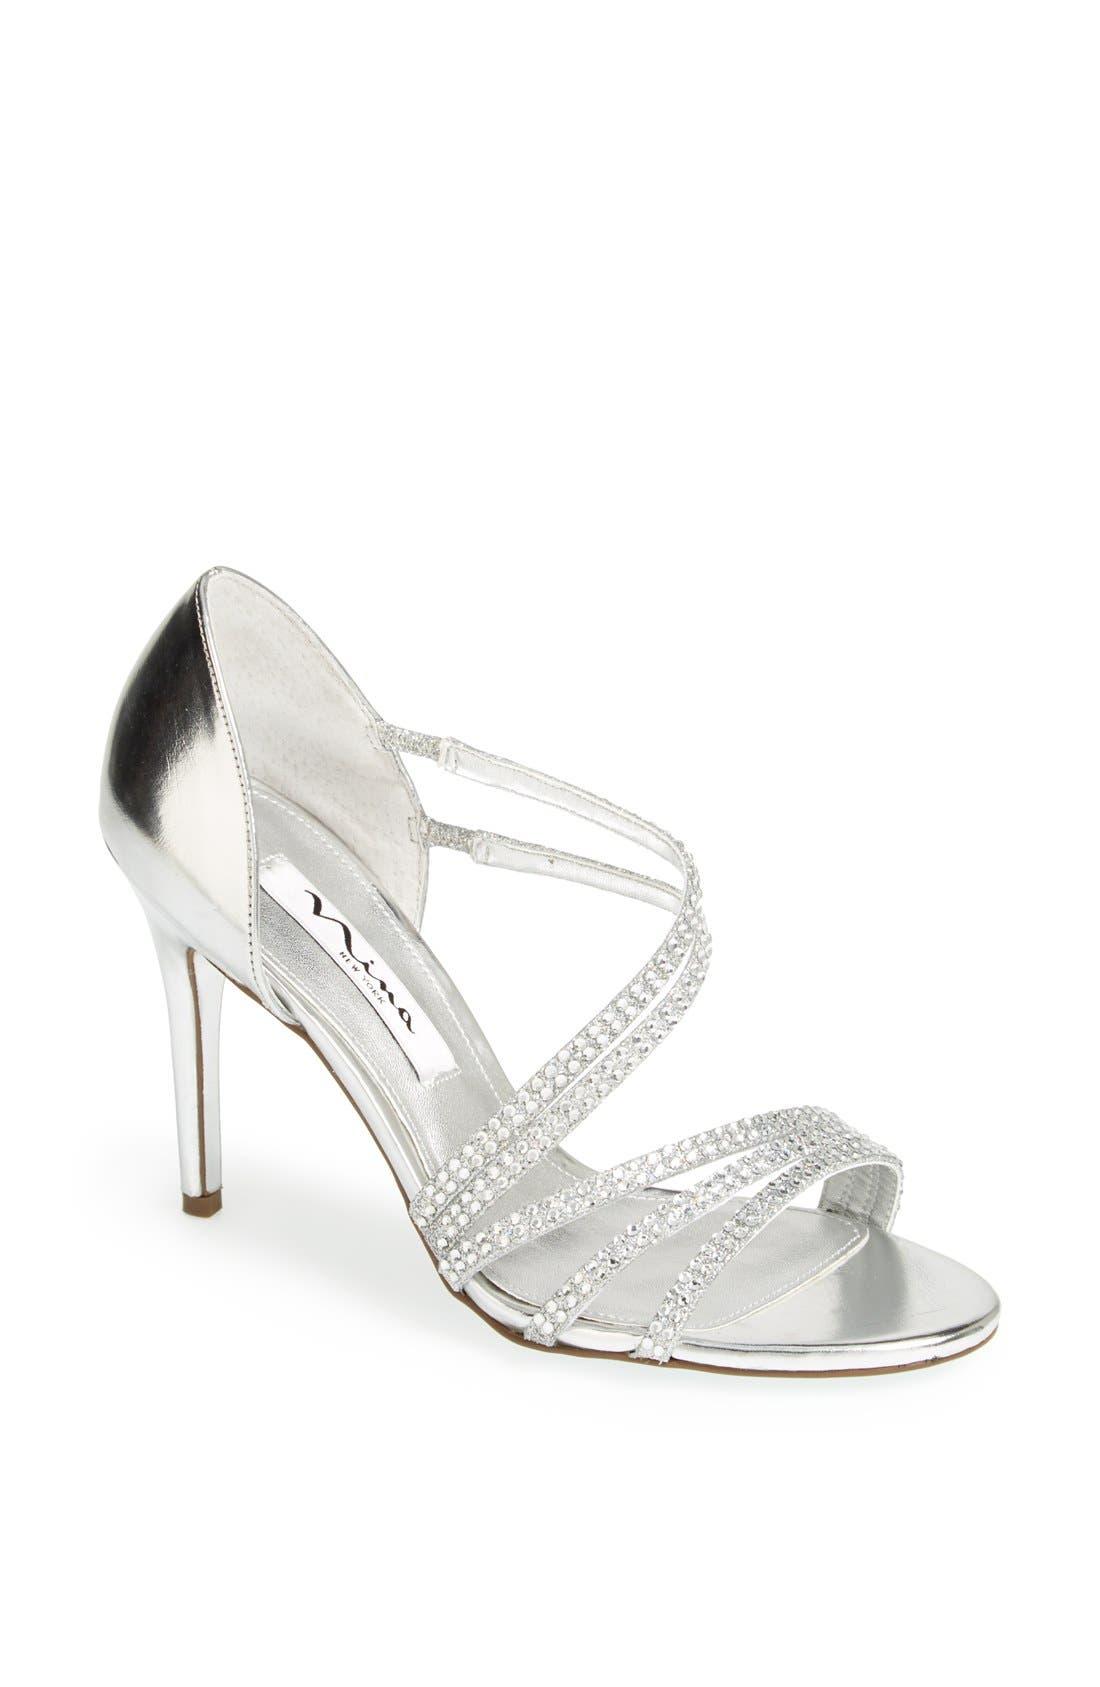 Main Image - Nina 'Coretta' Sandal